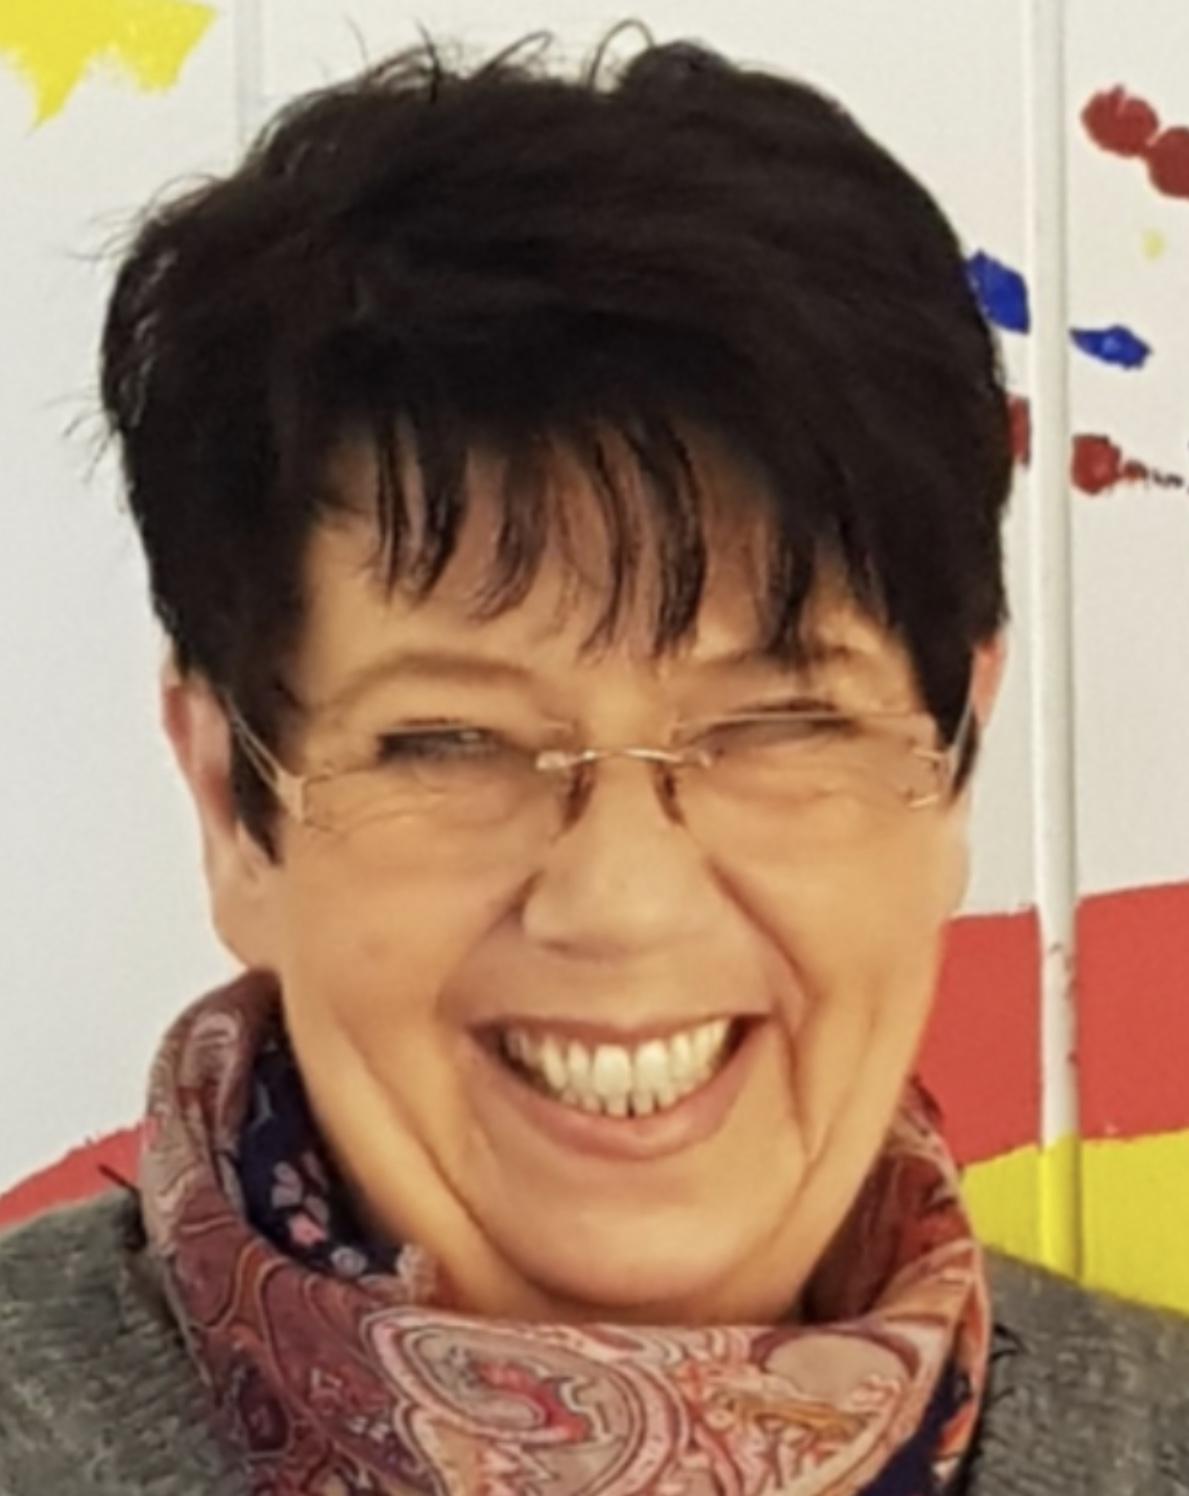 Inge Broich